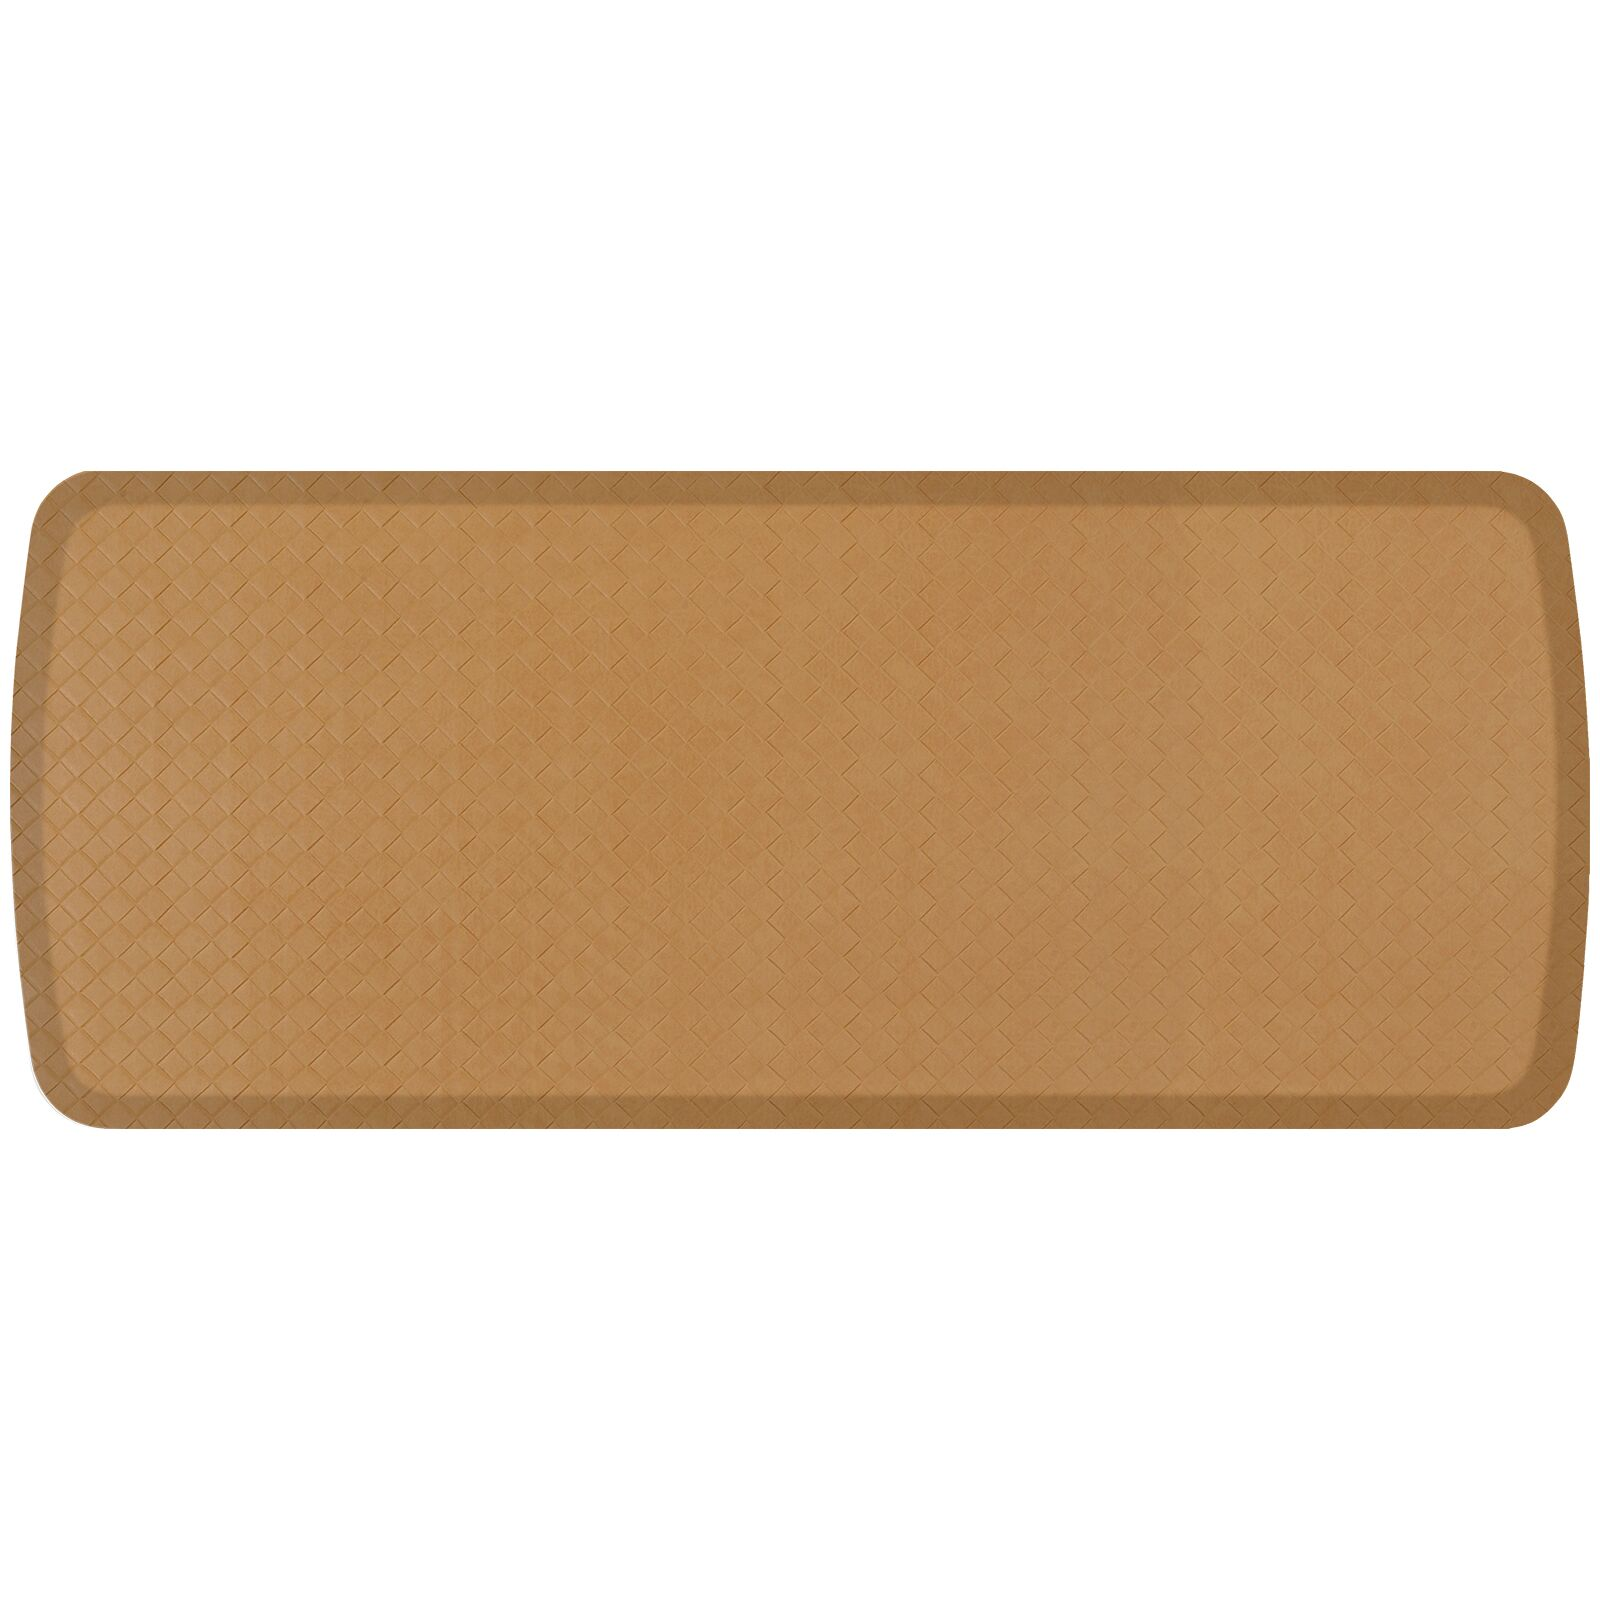 Basketweave Elite Premier Comfort Kitchen Mat Mat Size: 1'8